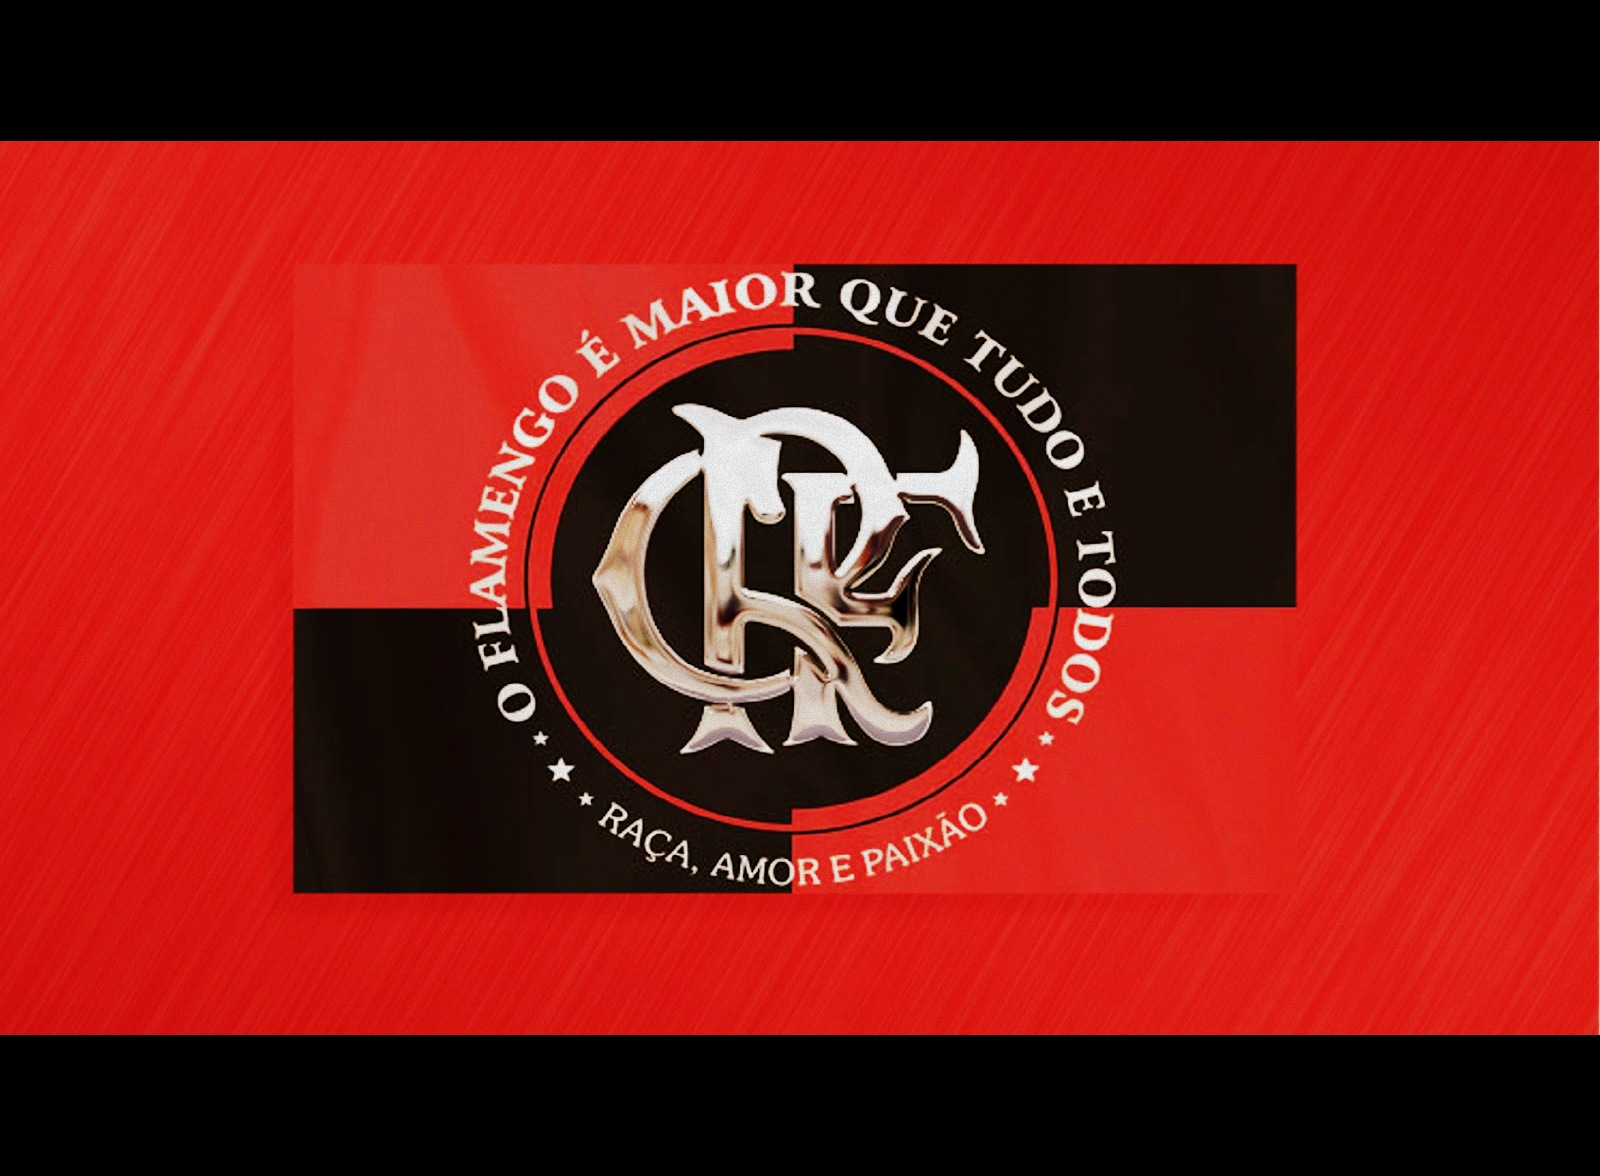 http://4.bp.blogspot.com/-m8HJo5rdMeU/UBcx4Rd4BNI/AAAAAAAABTE/Nsq2LGmv5-I/s1600/flamengo-wallpaper+(13).jpg